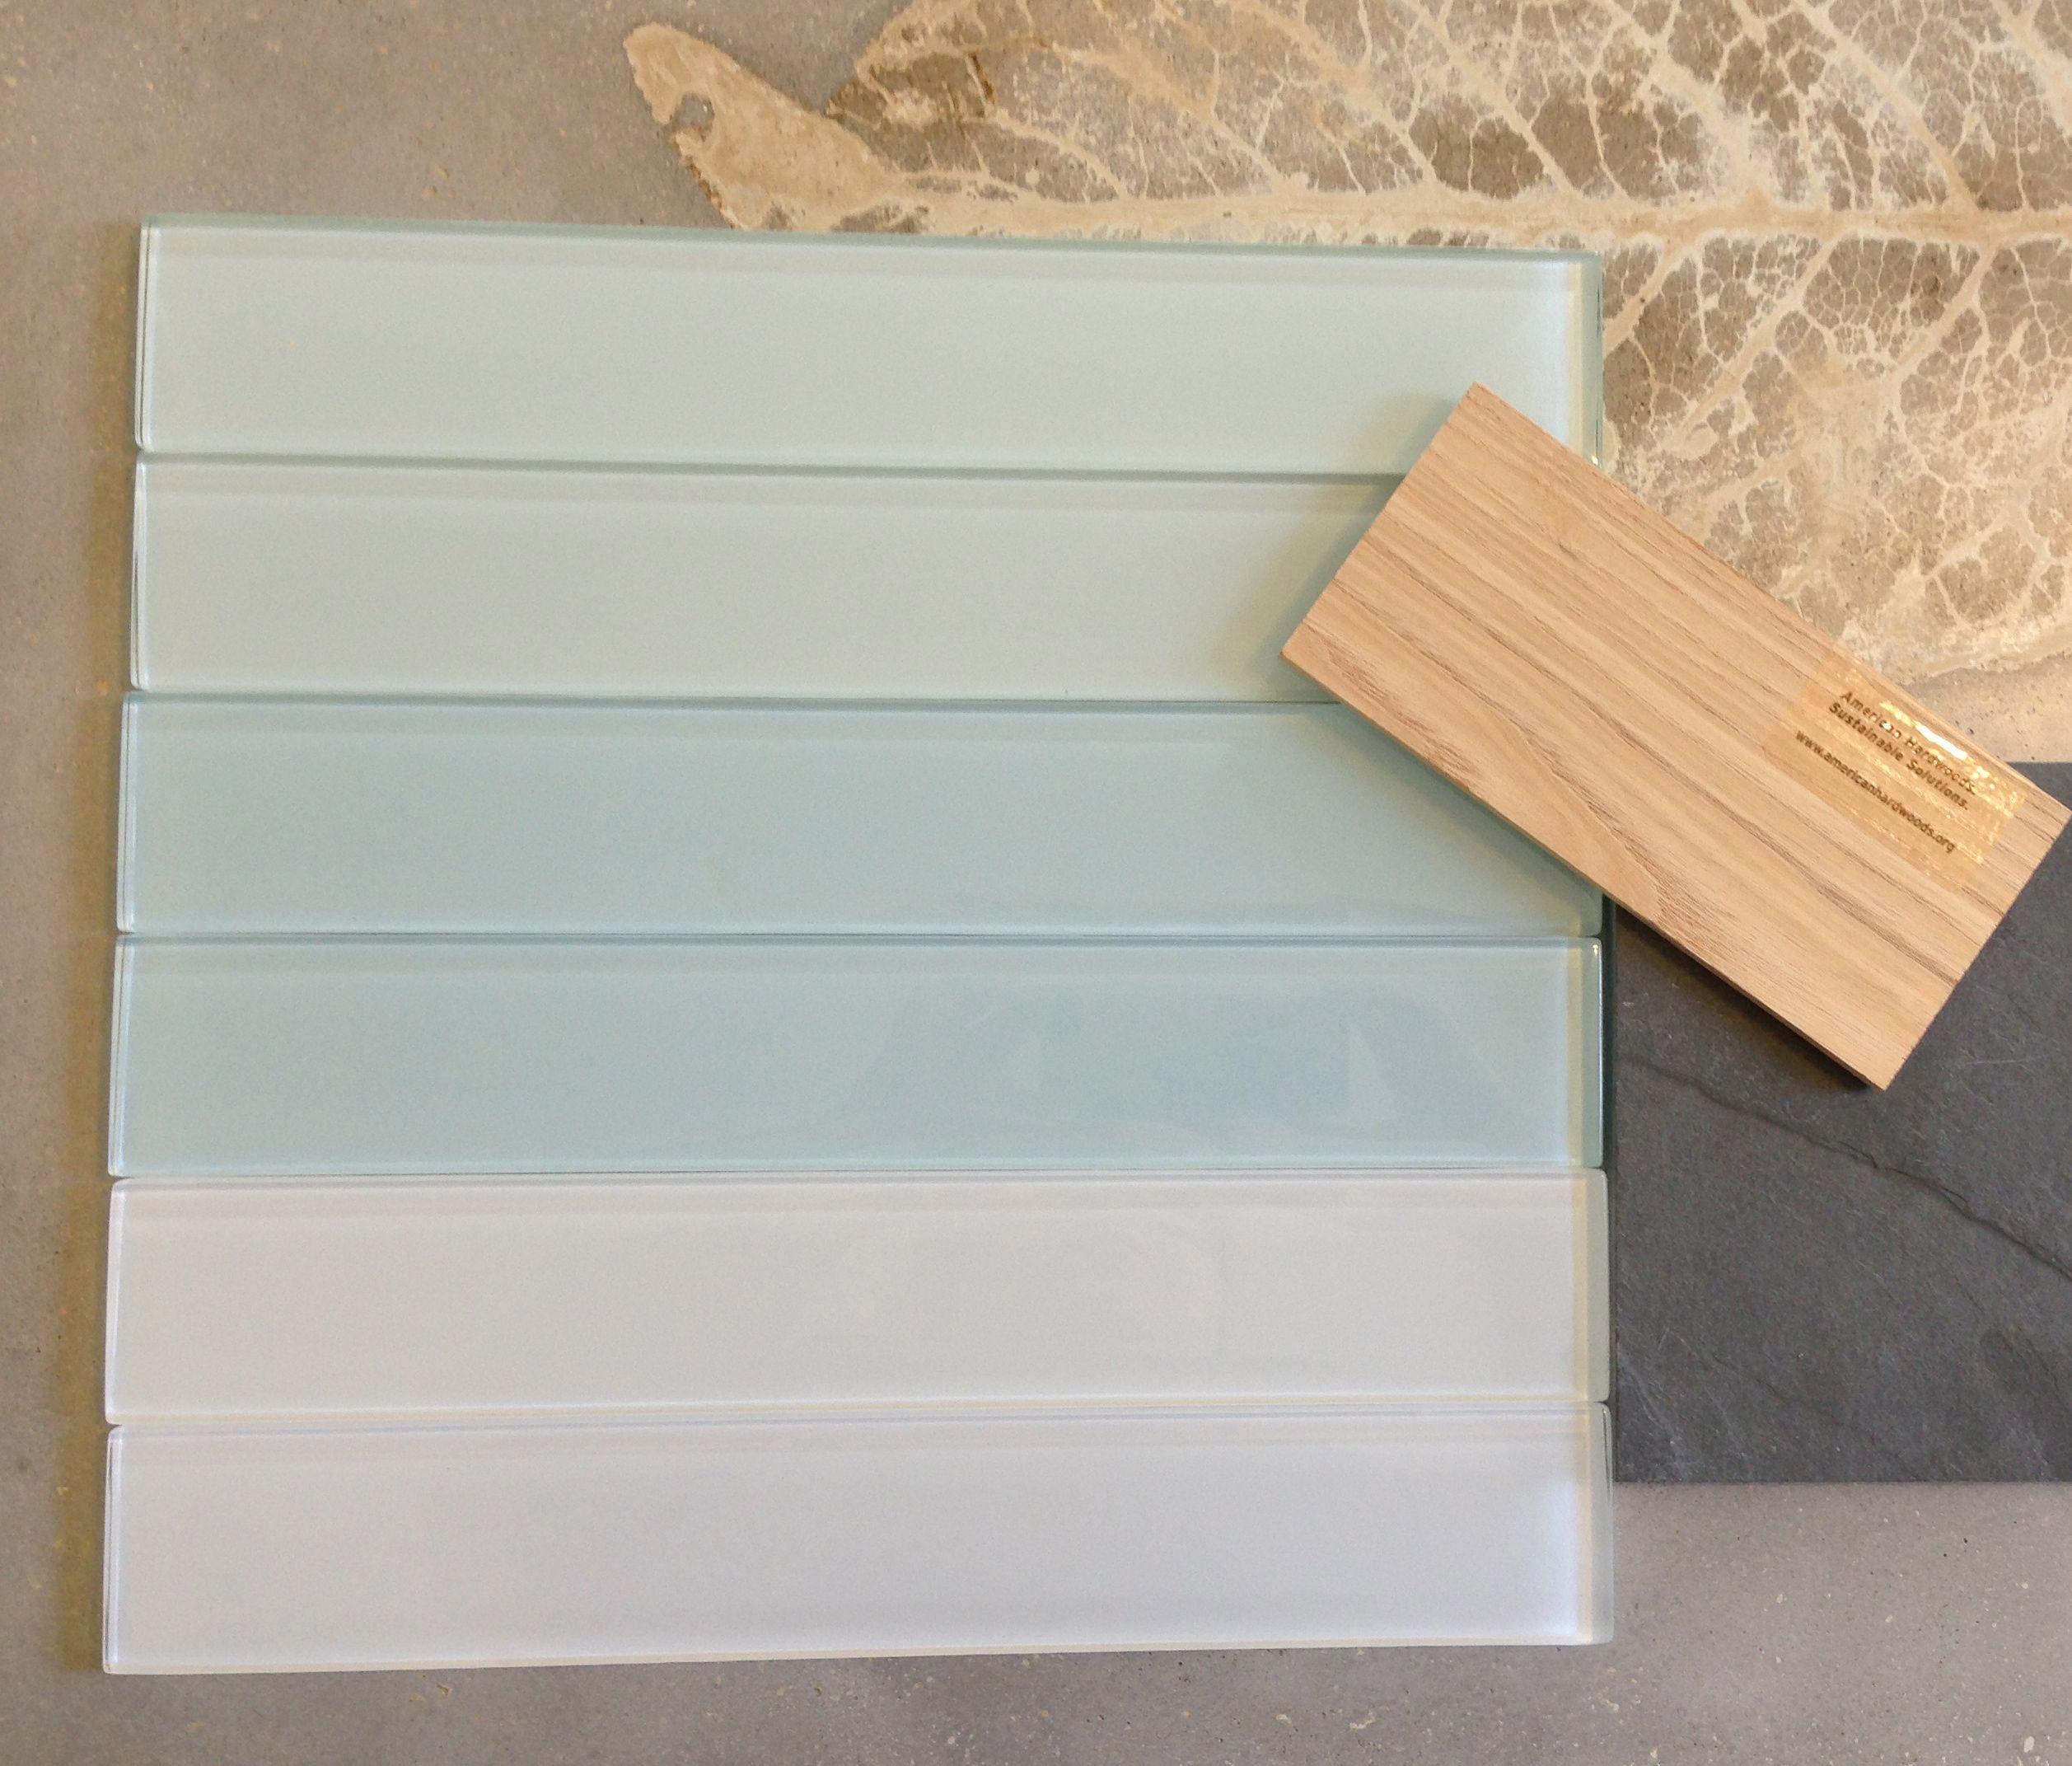 Simple Ann Sacks Glass Tile Backsplash Master Bathroom Lucian Inside Design Inspiration